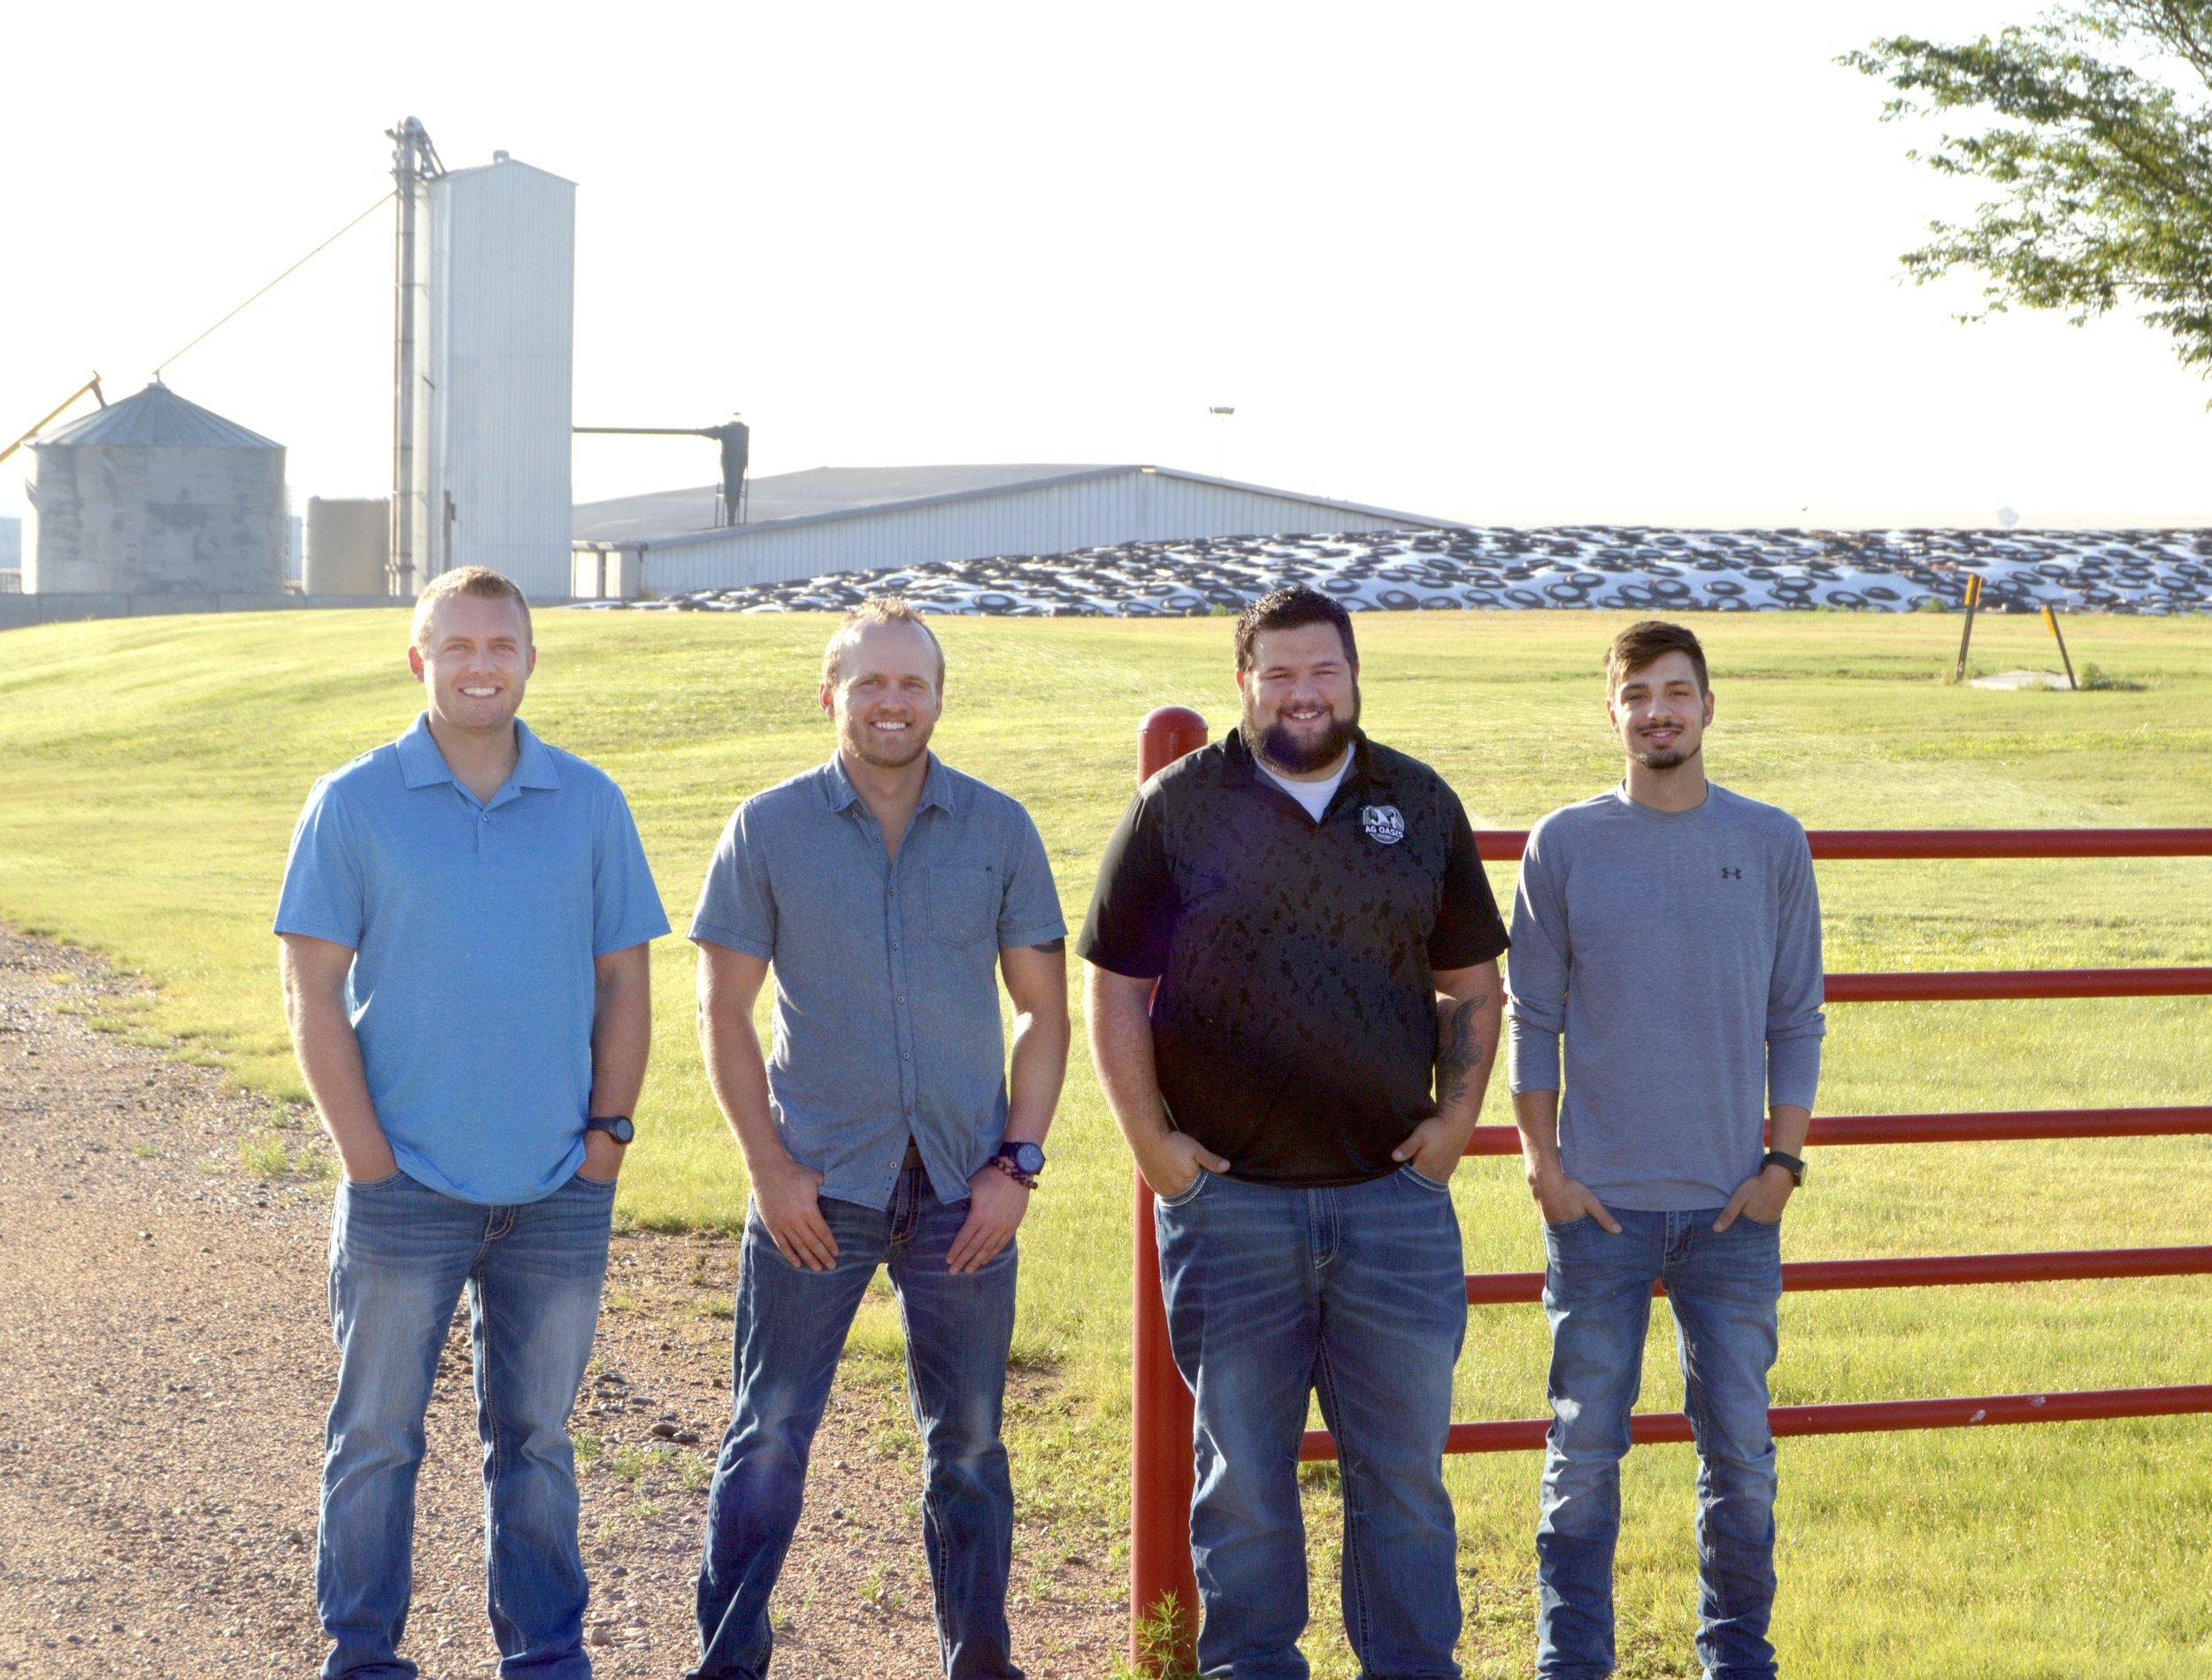 Parker Tuls, Pete Tuls Jr., Jeffery Hemann, Brad Hemann